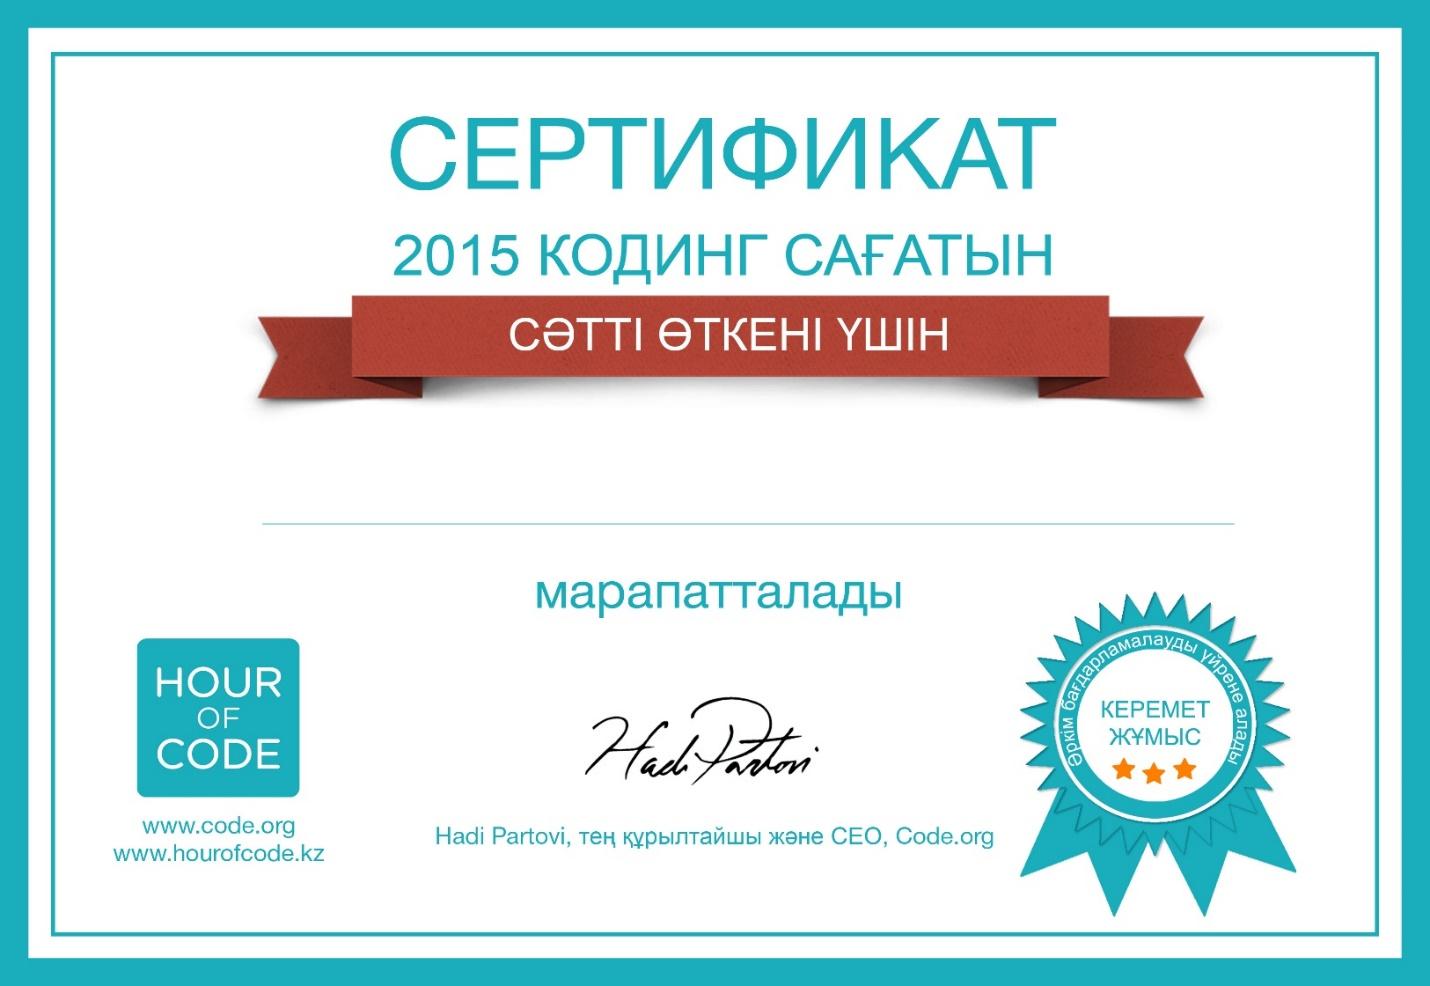 E:\Материалы\6 KAZ Okushularga sertifikat.jpg